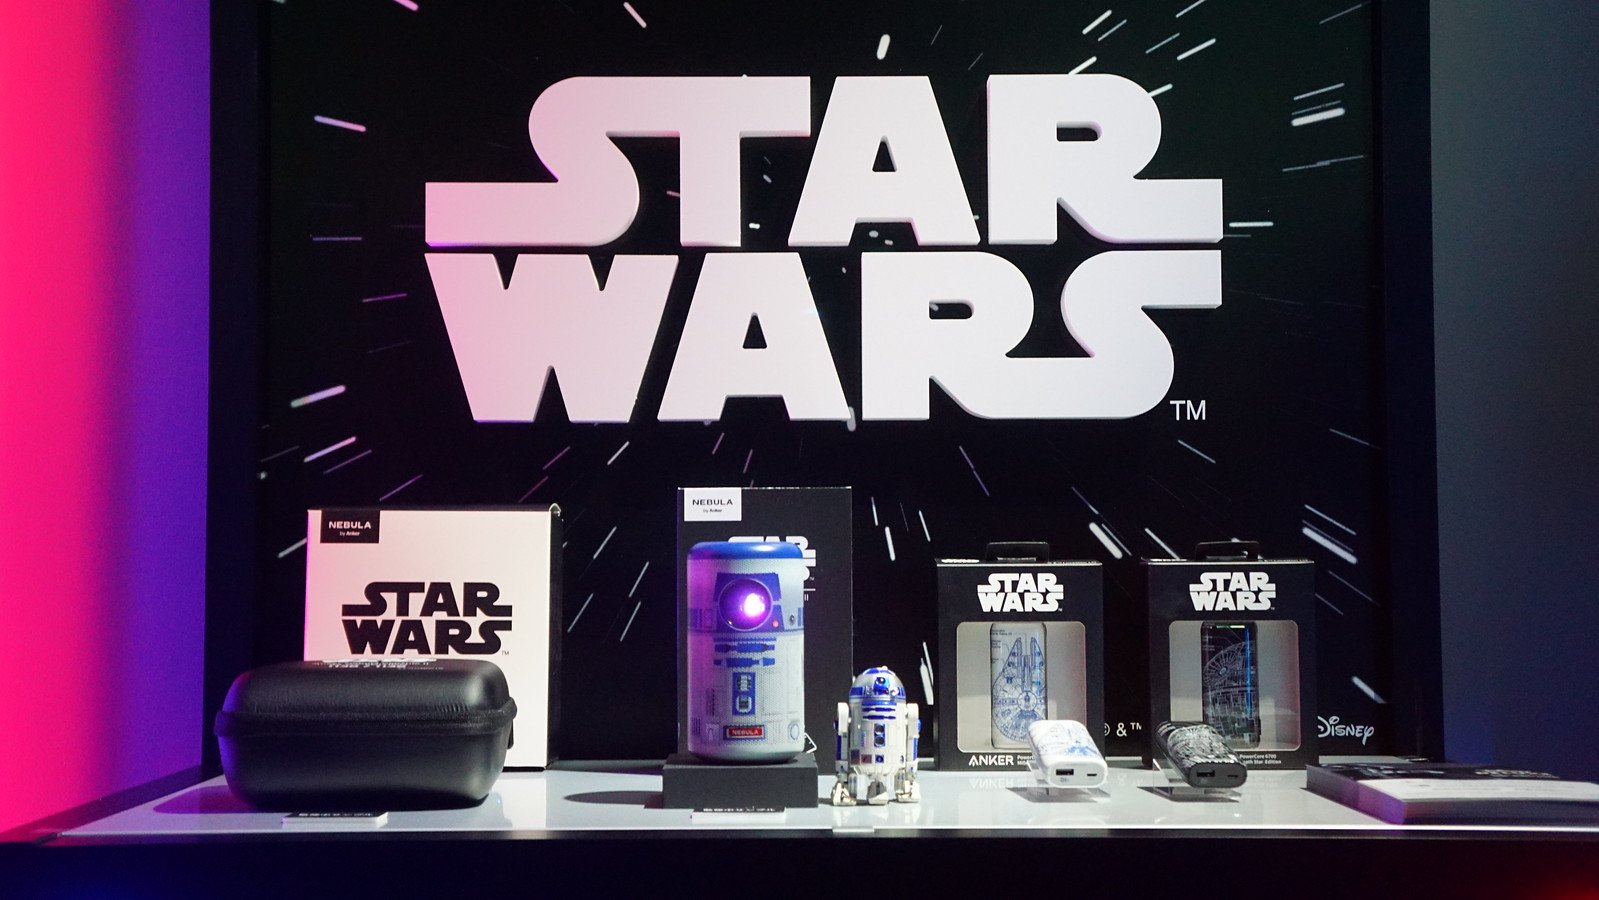 Anker、R2-D2デザインのプロジェクタ、STAR WARSデザインのモバイルバッテリーを限定発売